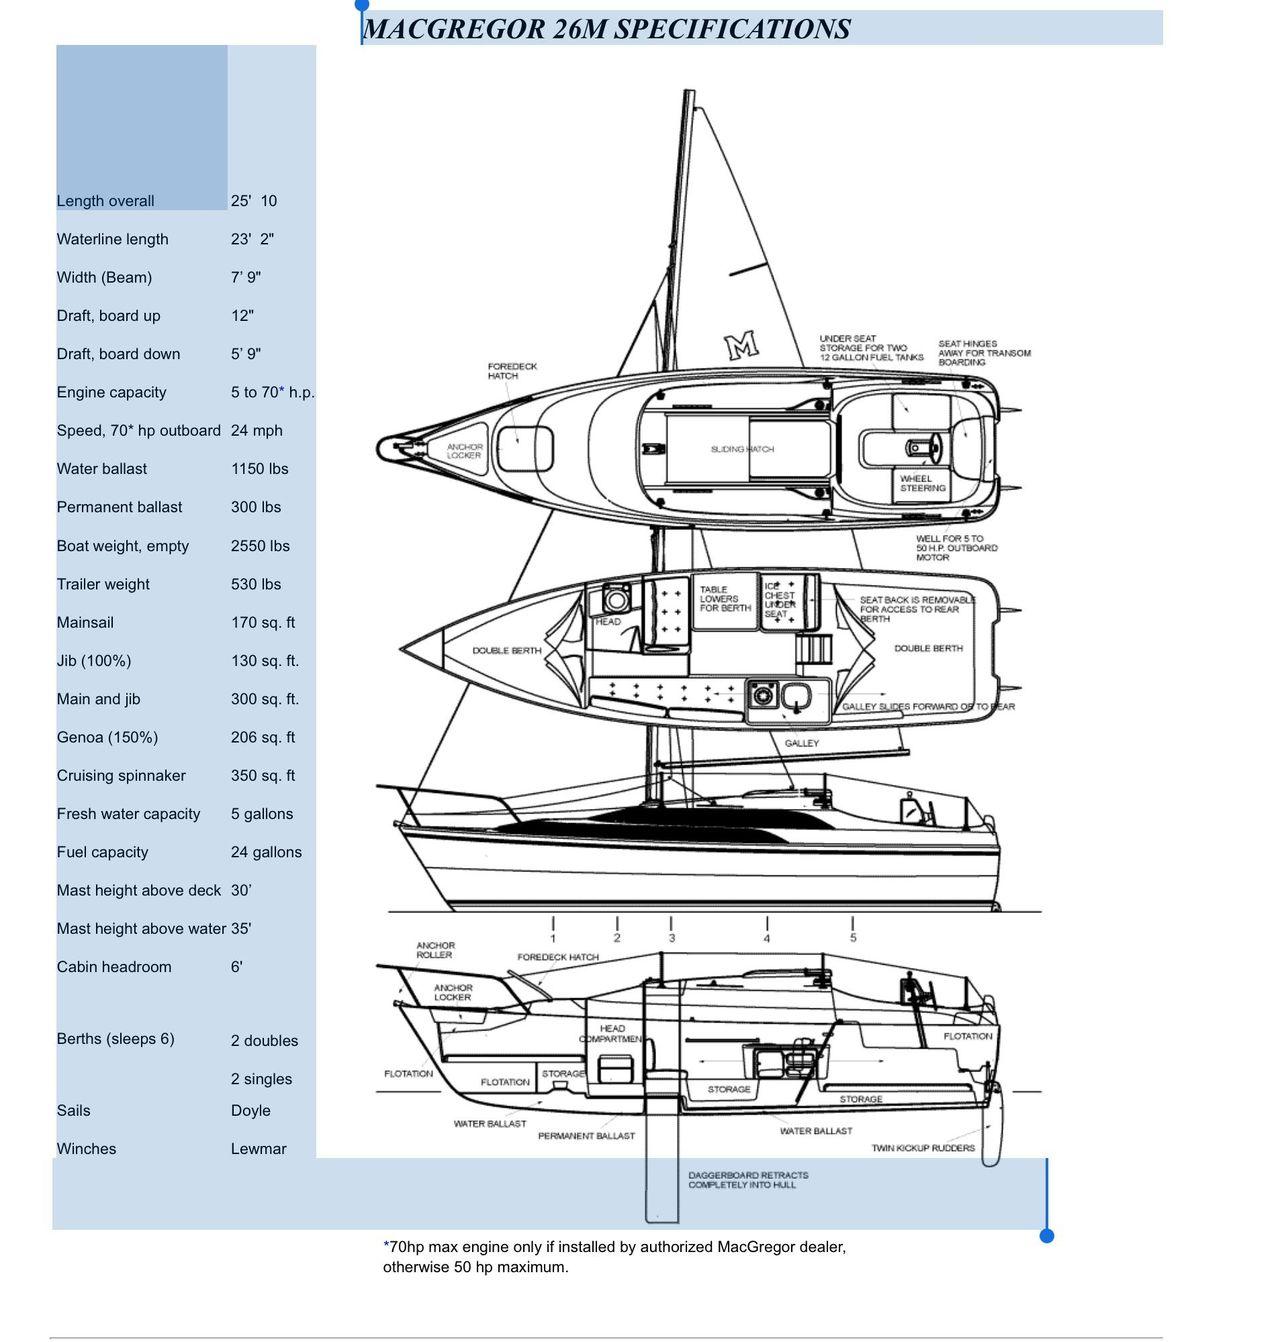 2002 Used Macgregor 26 Cruiser Sailboat For Sale - $17,900